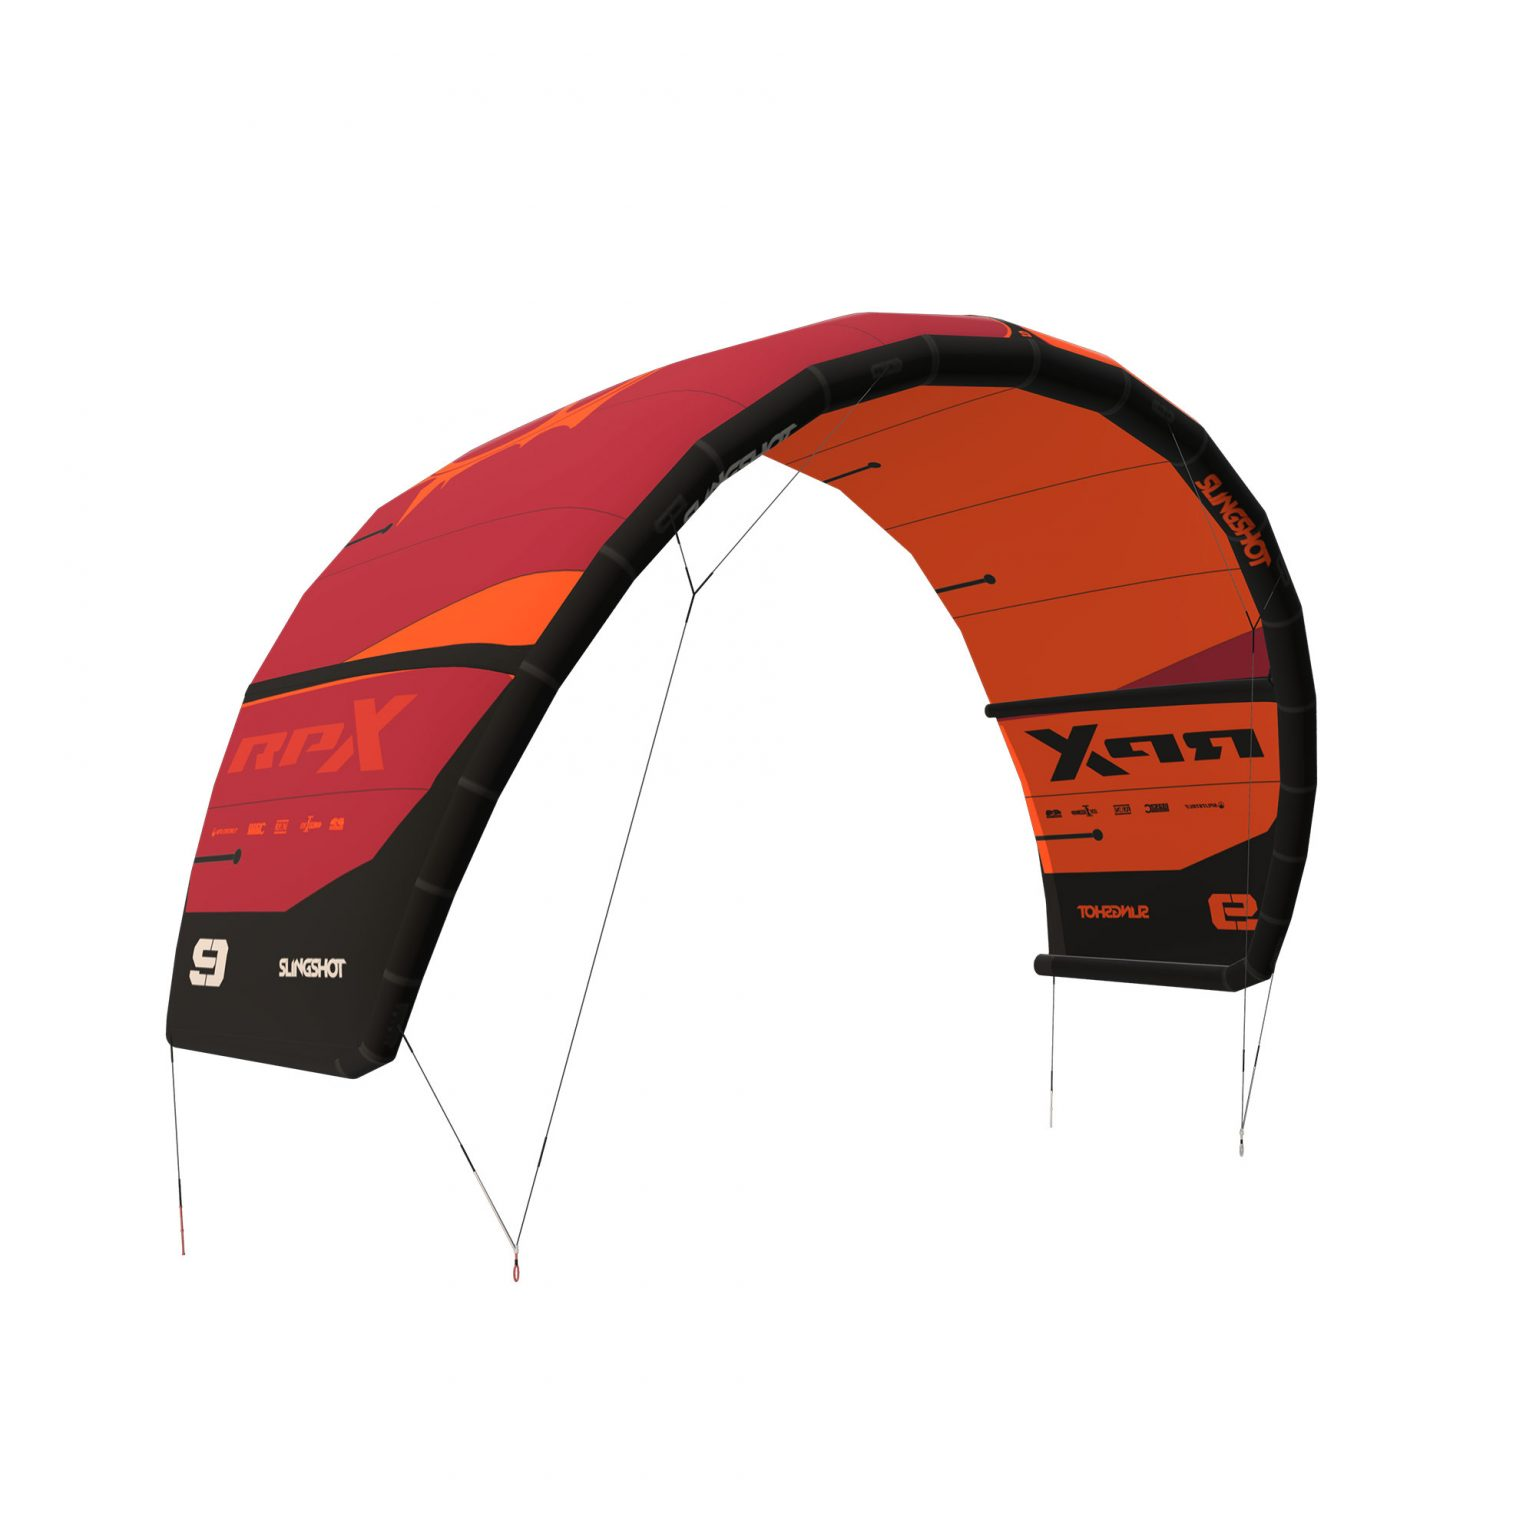 Slingshot RPX V1 Orange- Slingshot RPX Kitesurfing Kite